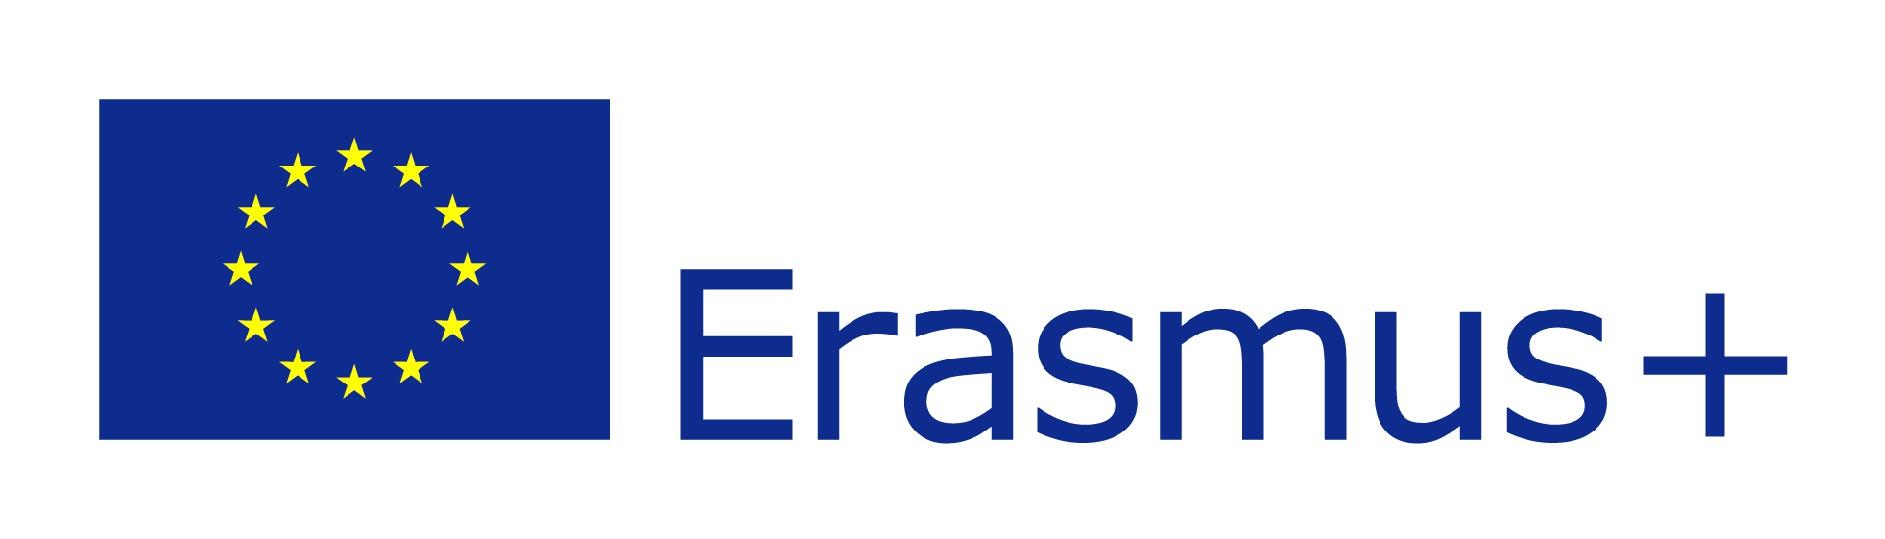 Erasmus+ EU Logo Colour-001